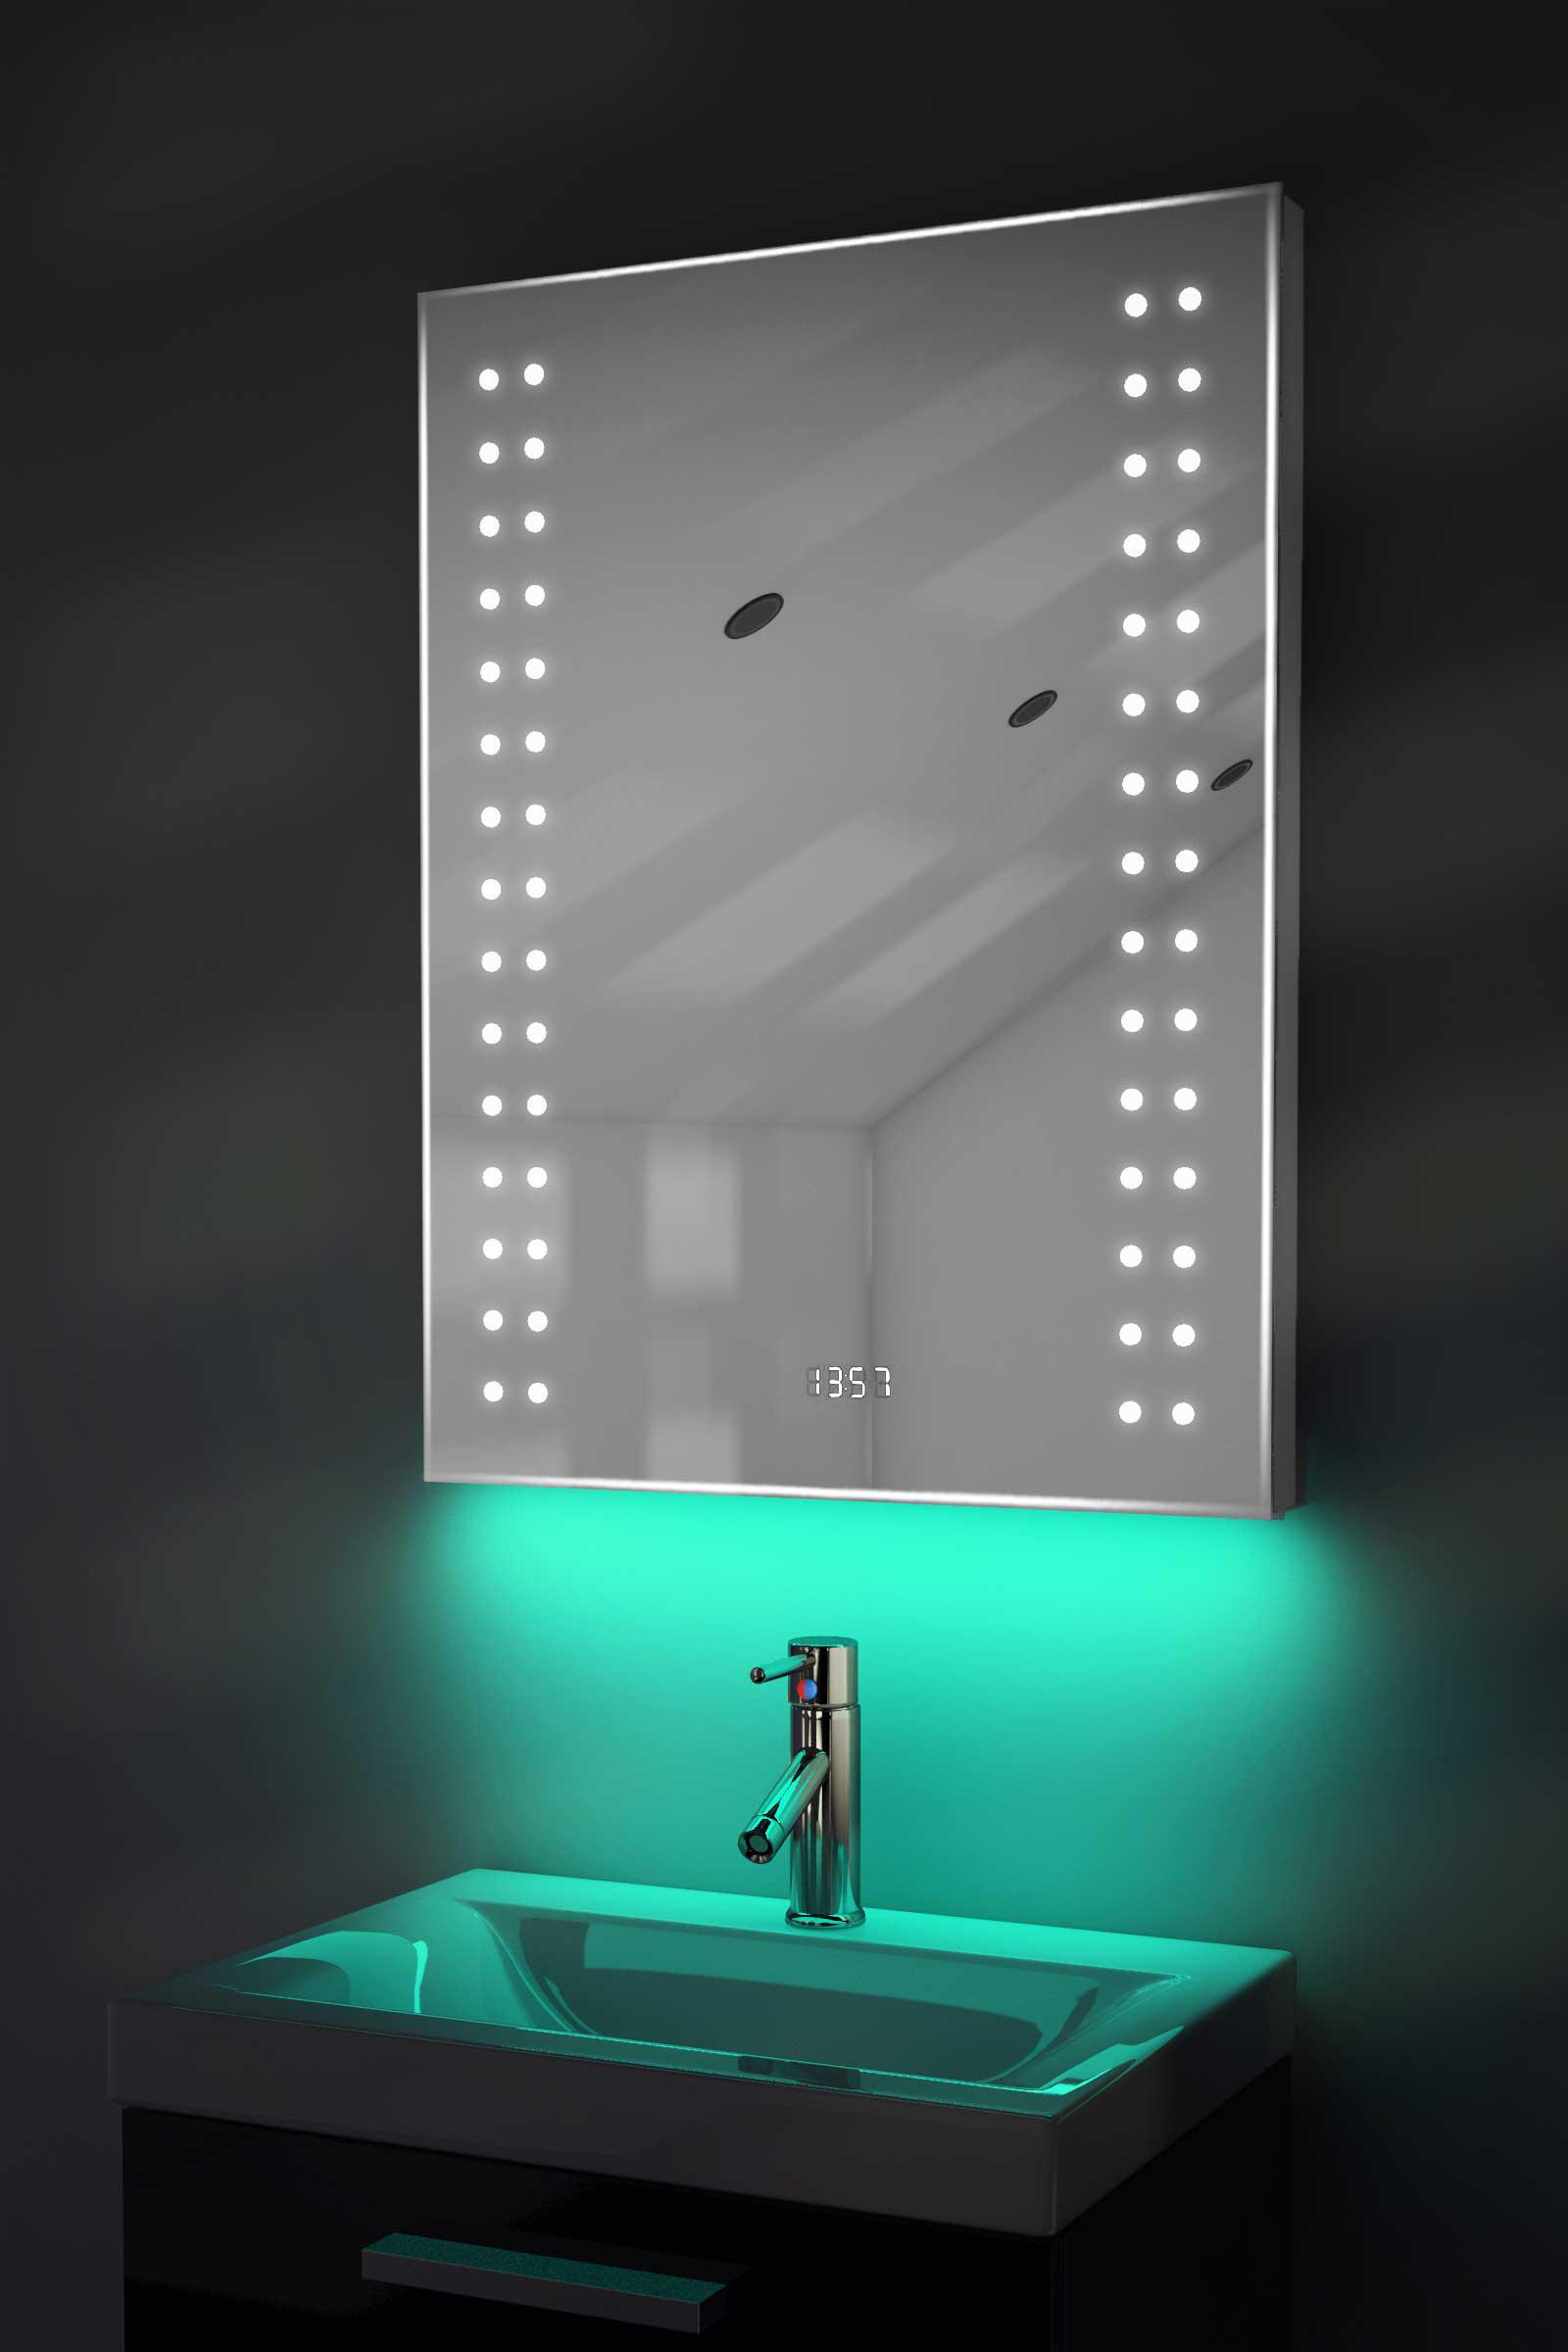 badspiegel mit uhr rgb beleuchtung heizung sensor rasiersteckdose k187rgb ebay. Black Bedroom Furniture Sets. Home Design Ideas